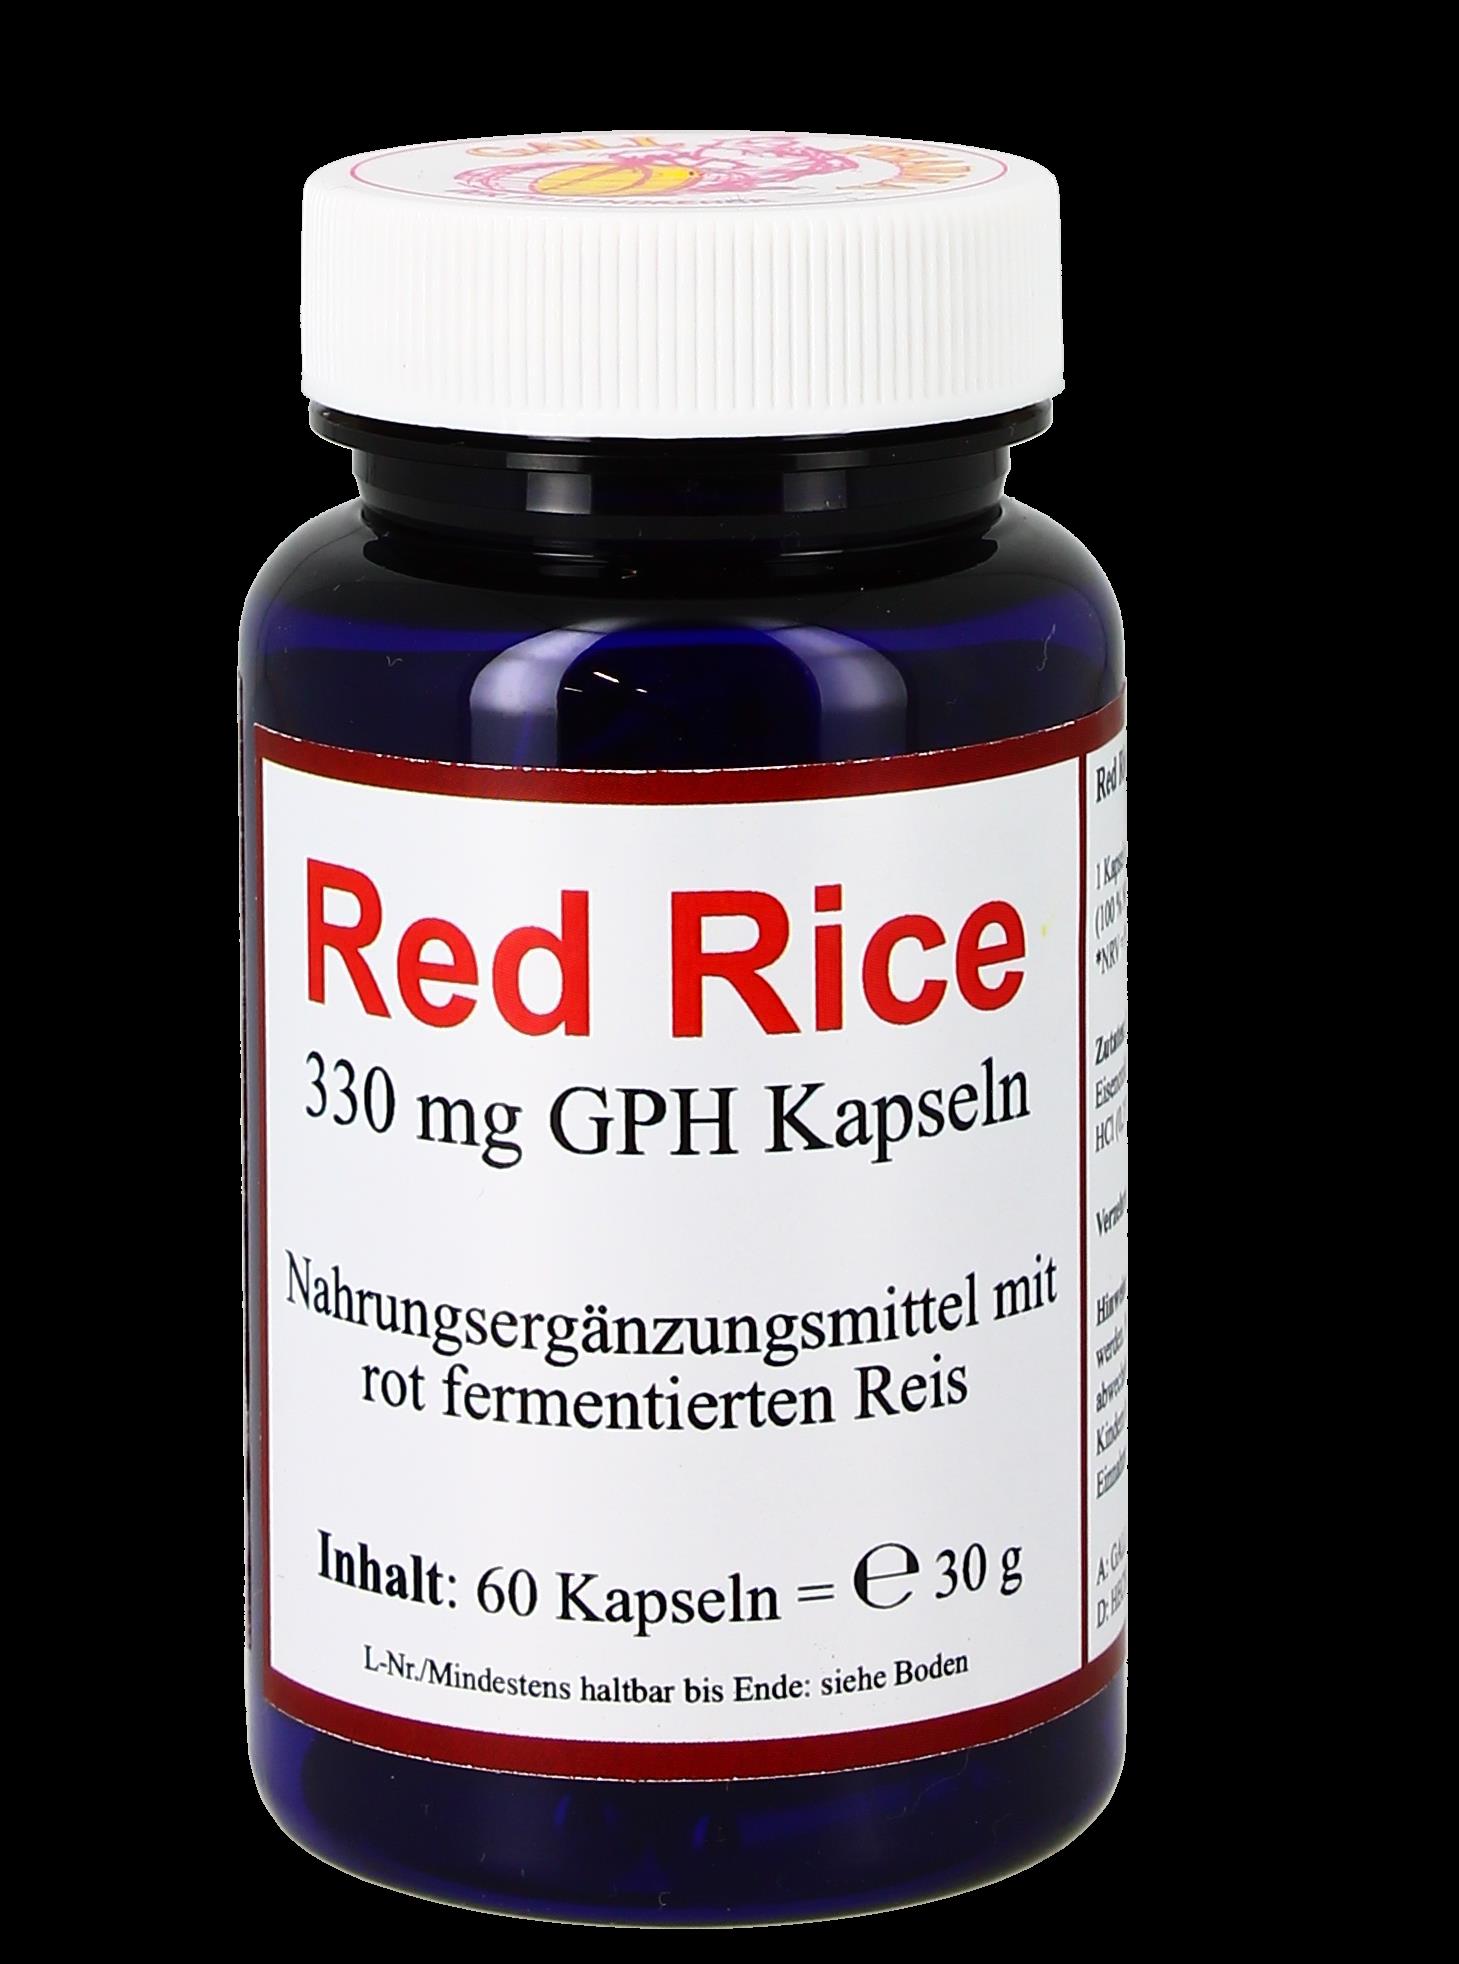 Red Rice 330 mg GPH Kapseln